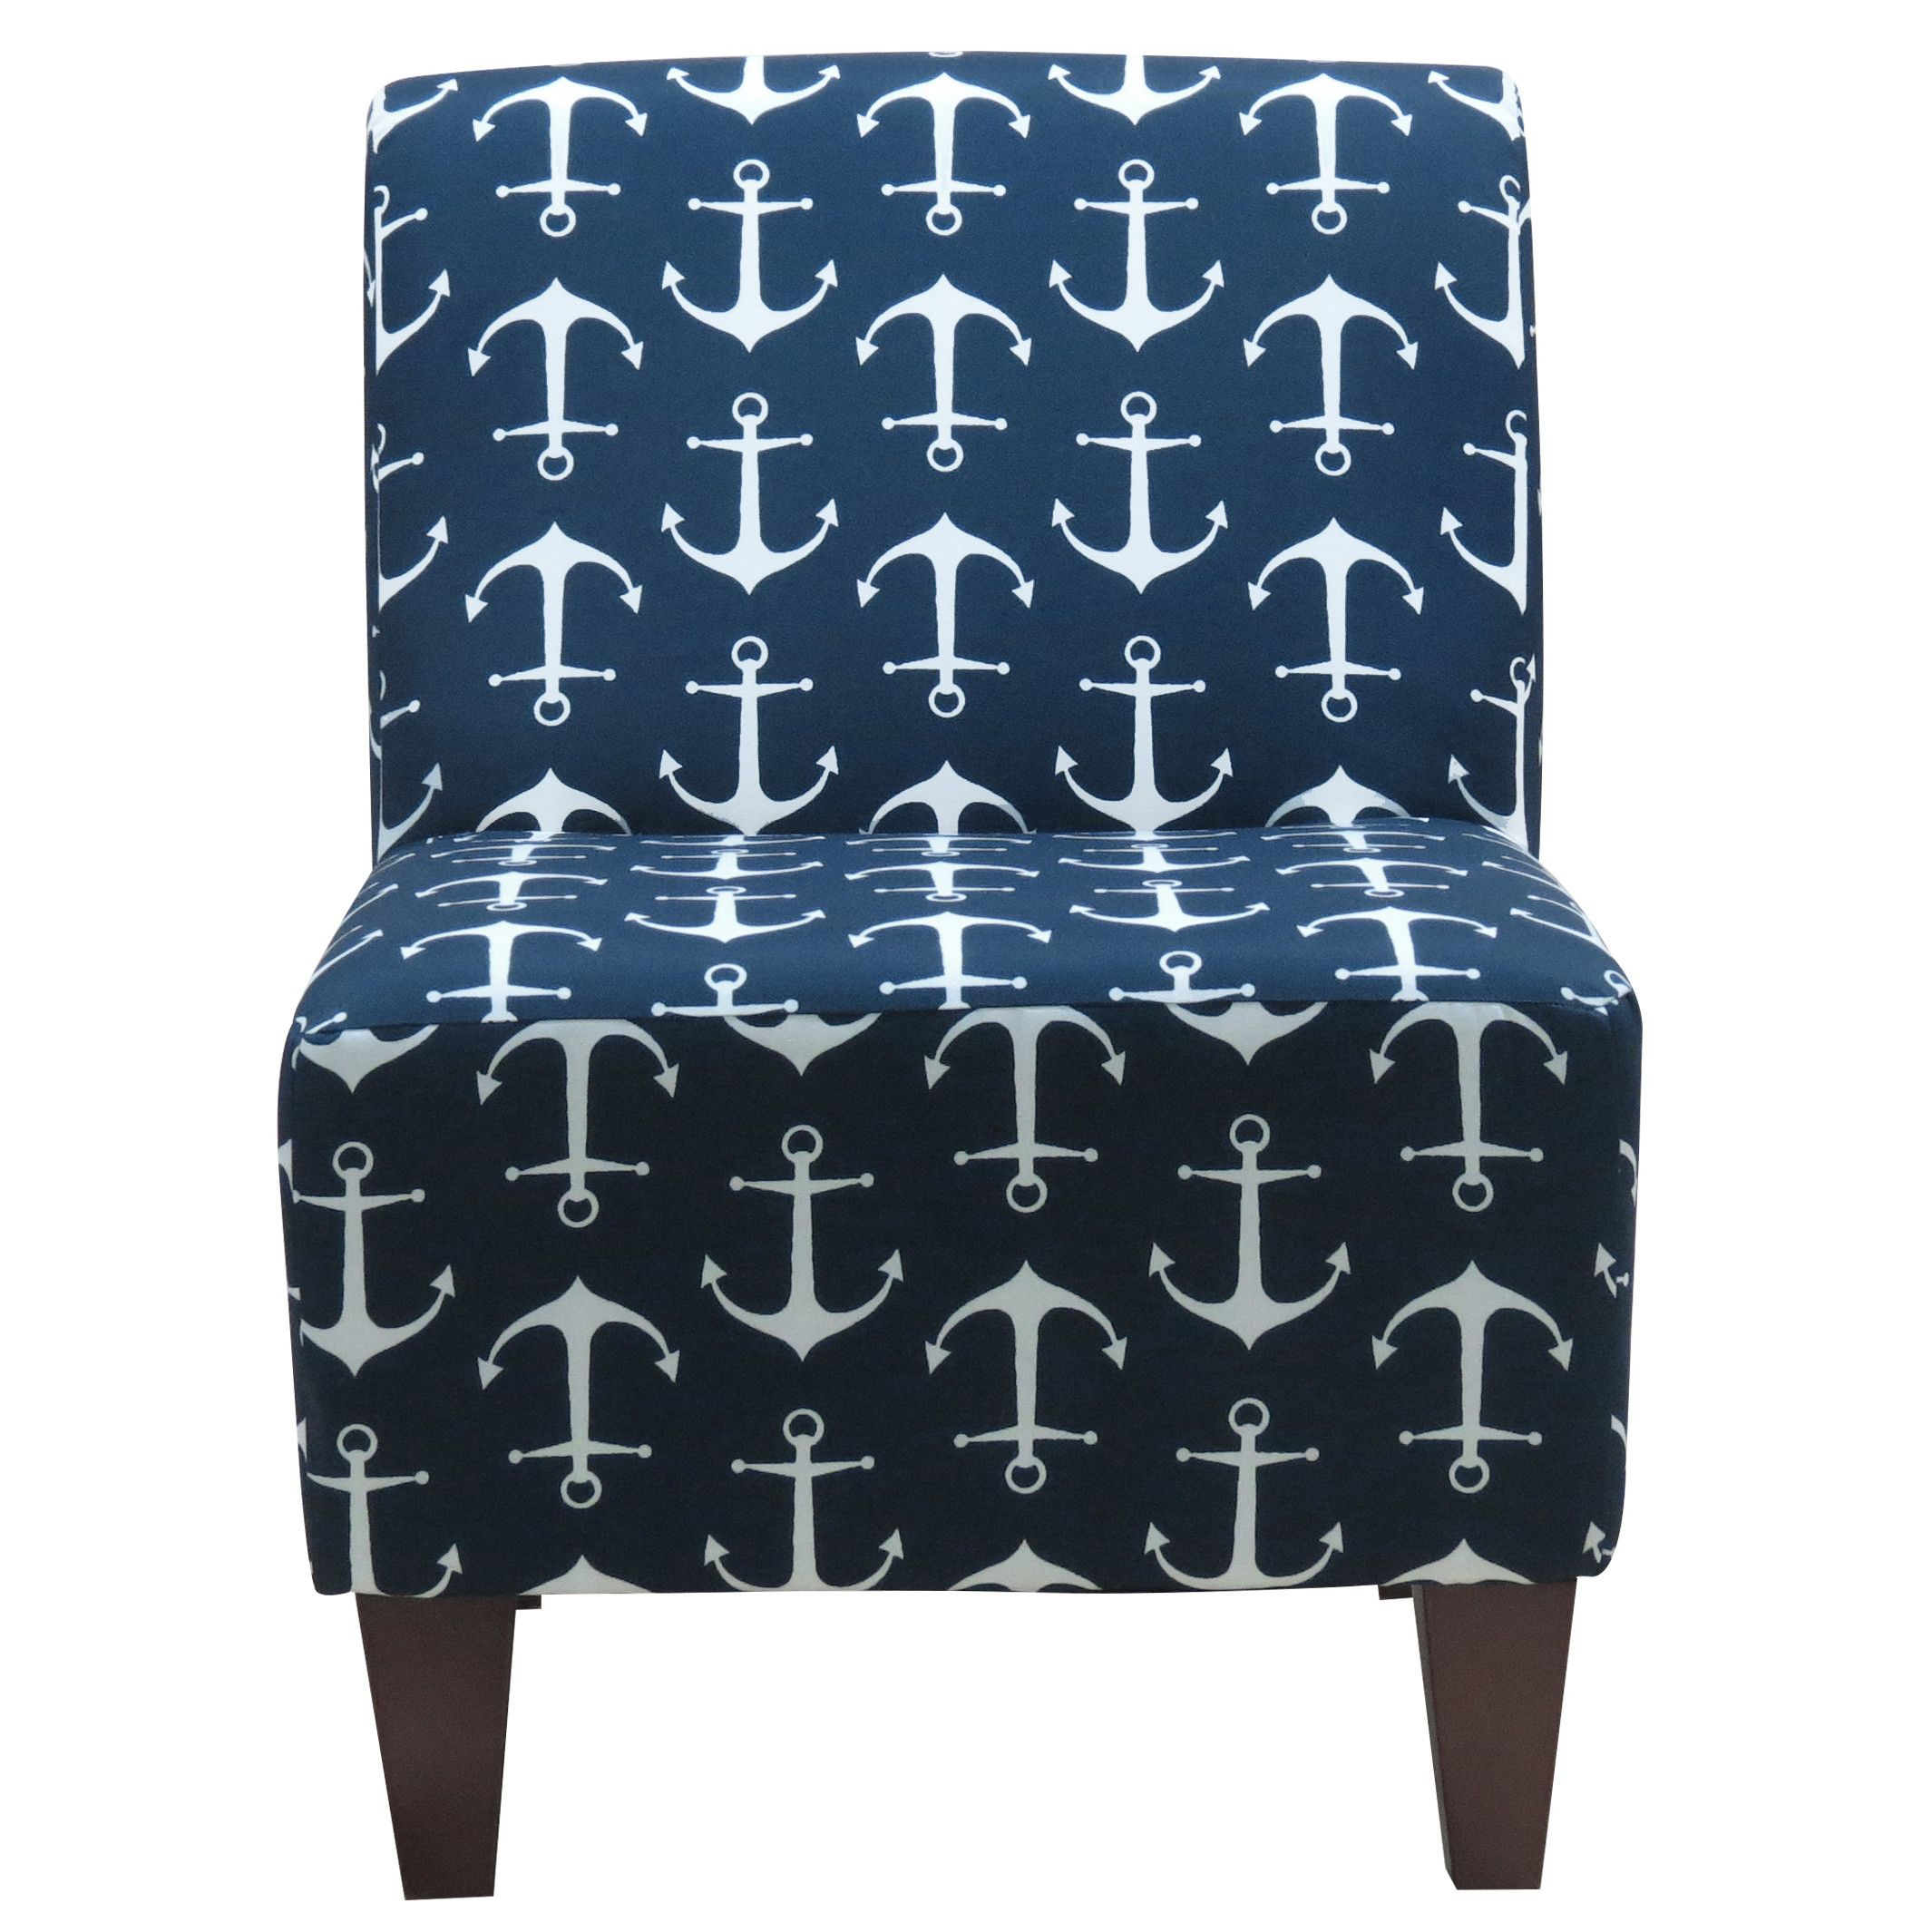 Breakwater Bay Hartly Sailor Anchor Armless Slipper Chair